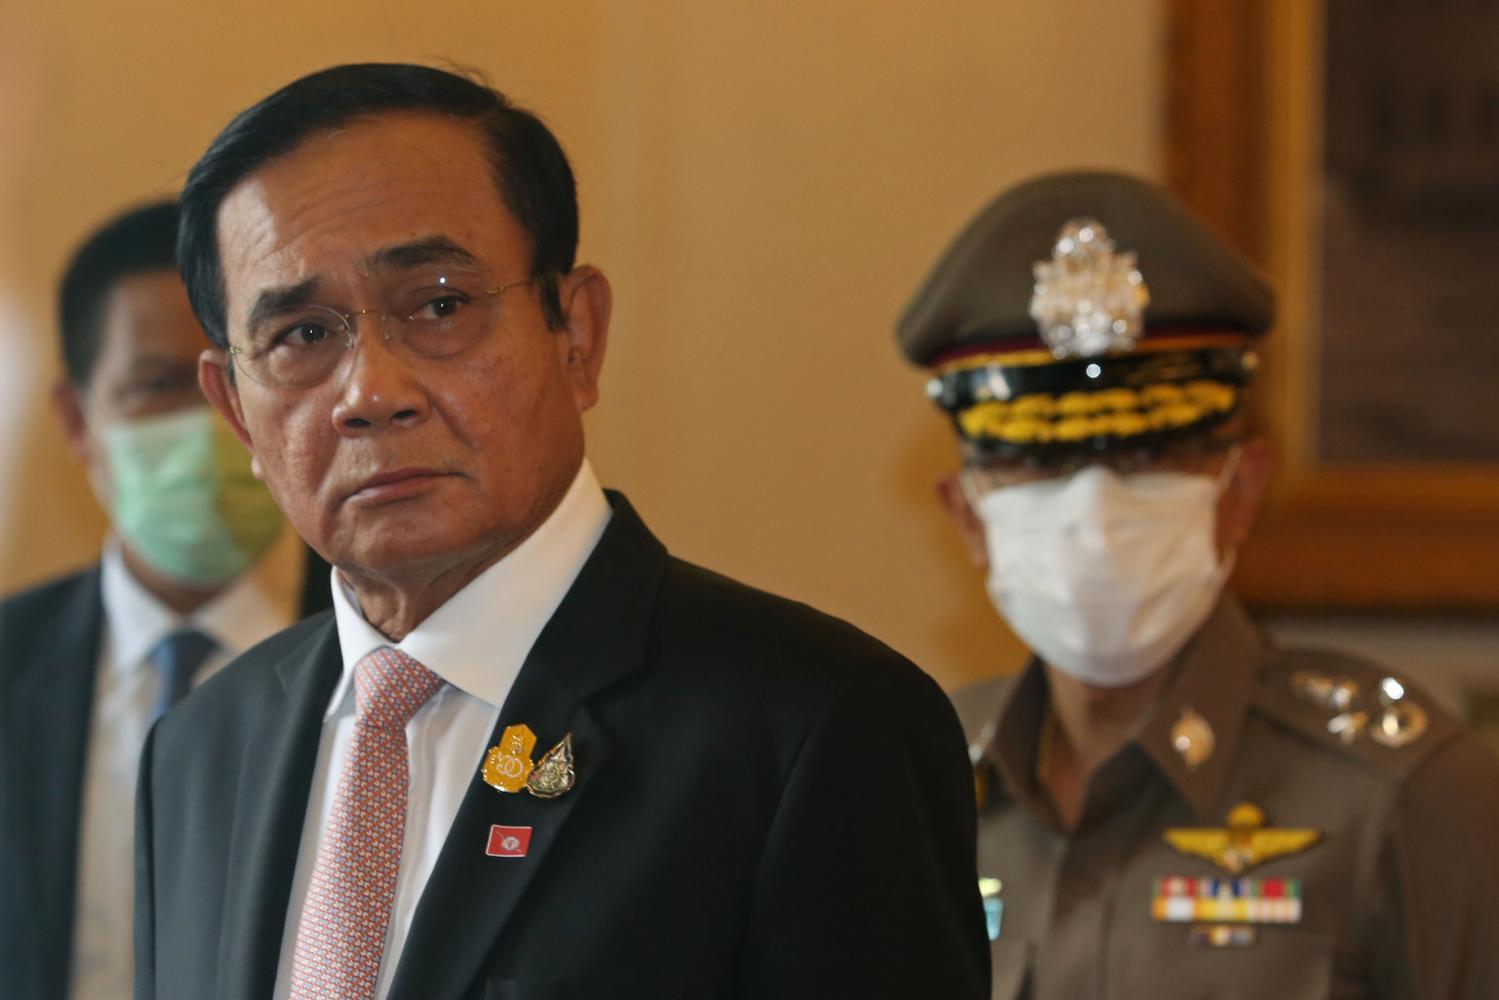 Prayut: Had been in self-isolation